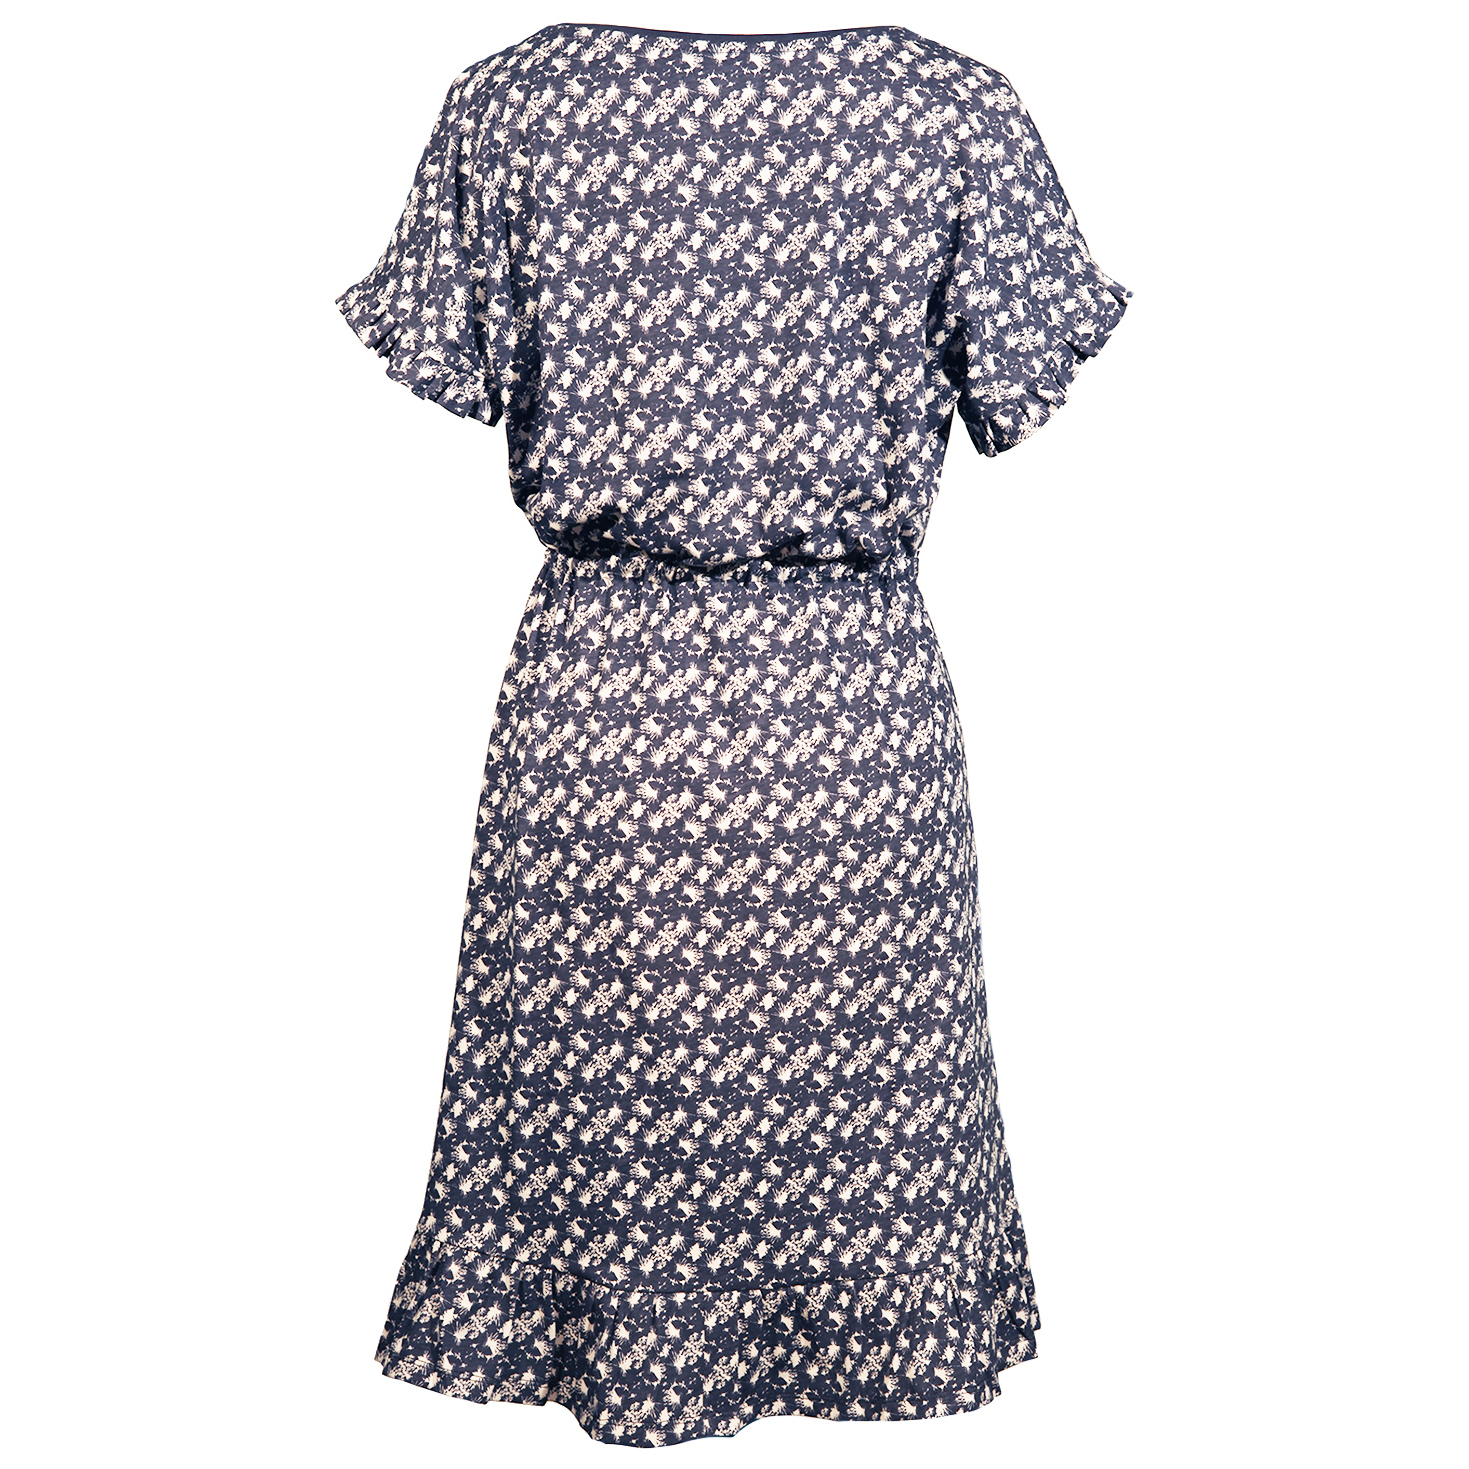 Printet kjole med bindebånd i taljen